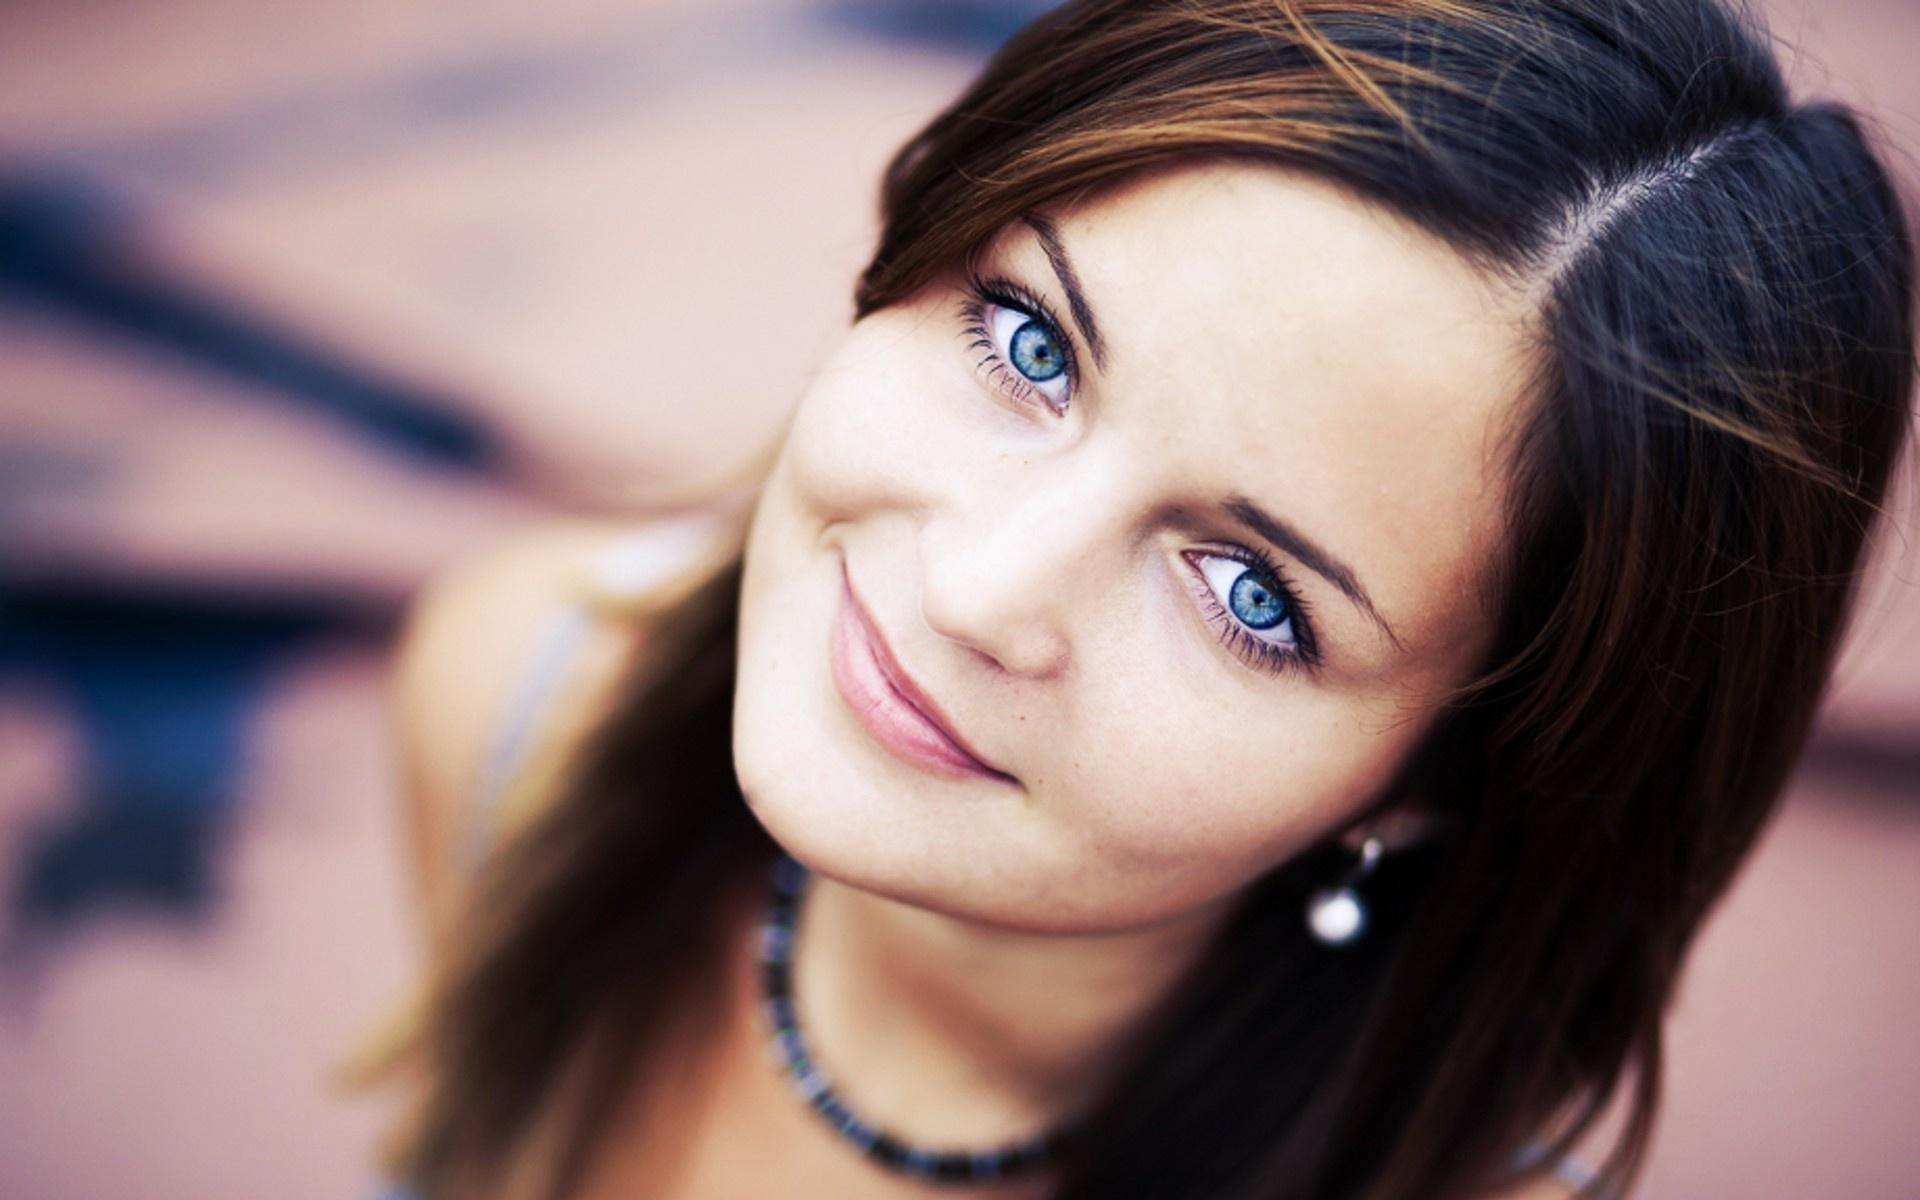 بالصور صور عيون جميلات , اجمل صور لعيون جذابة 5860 4